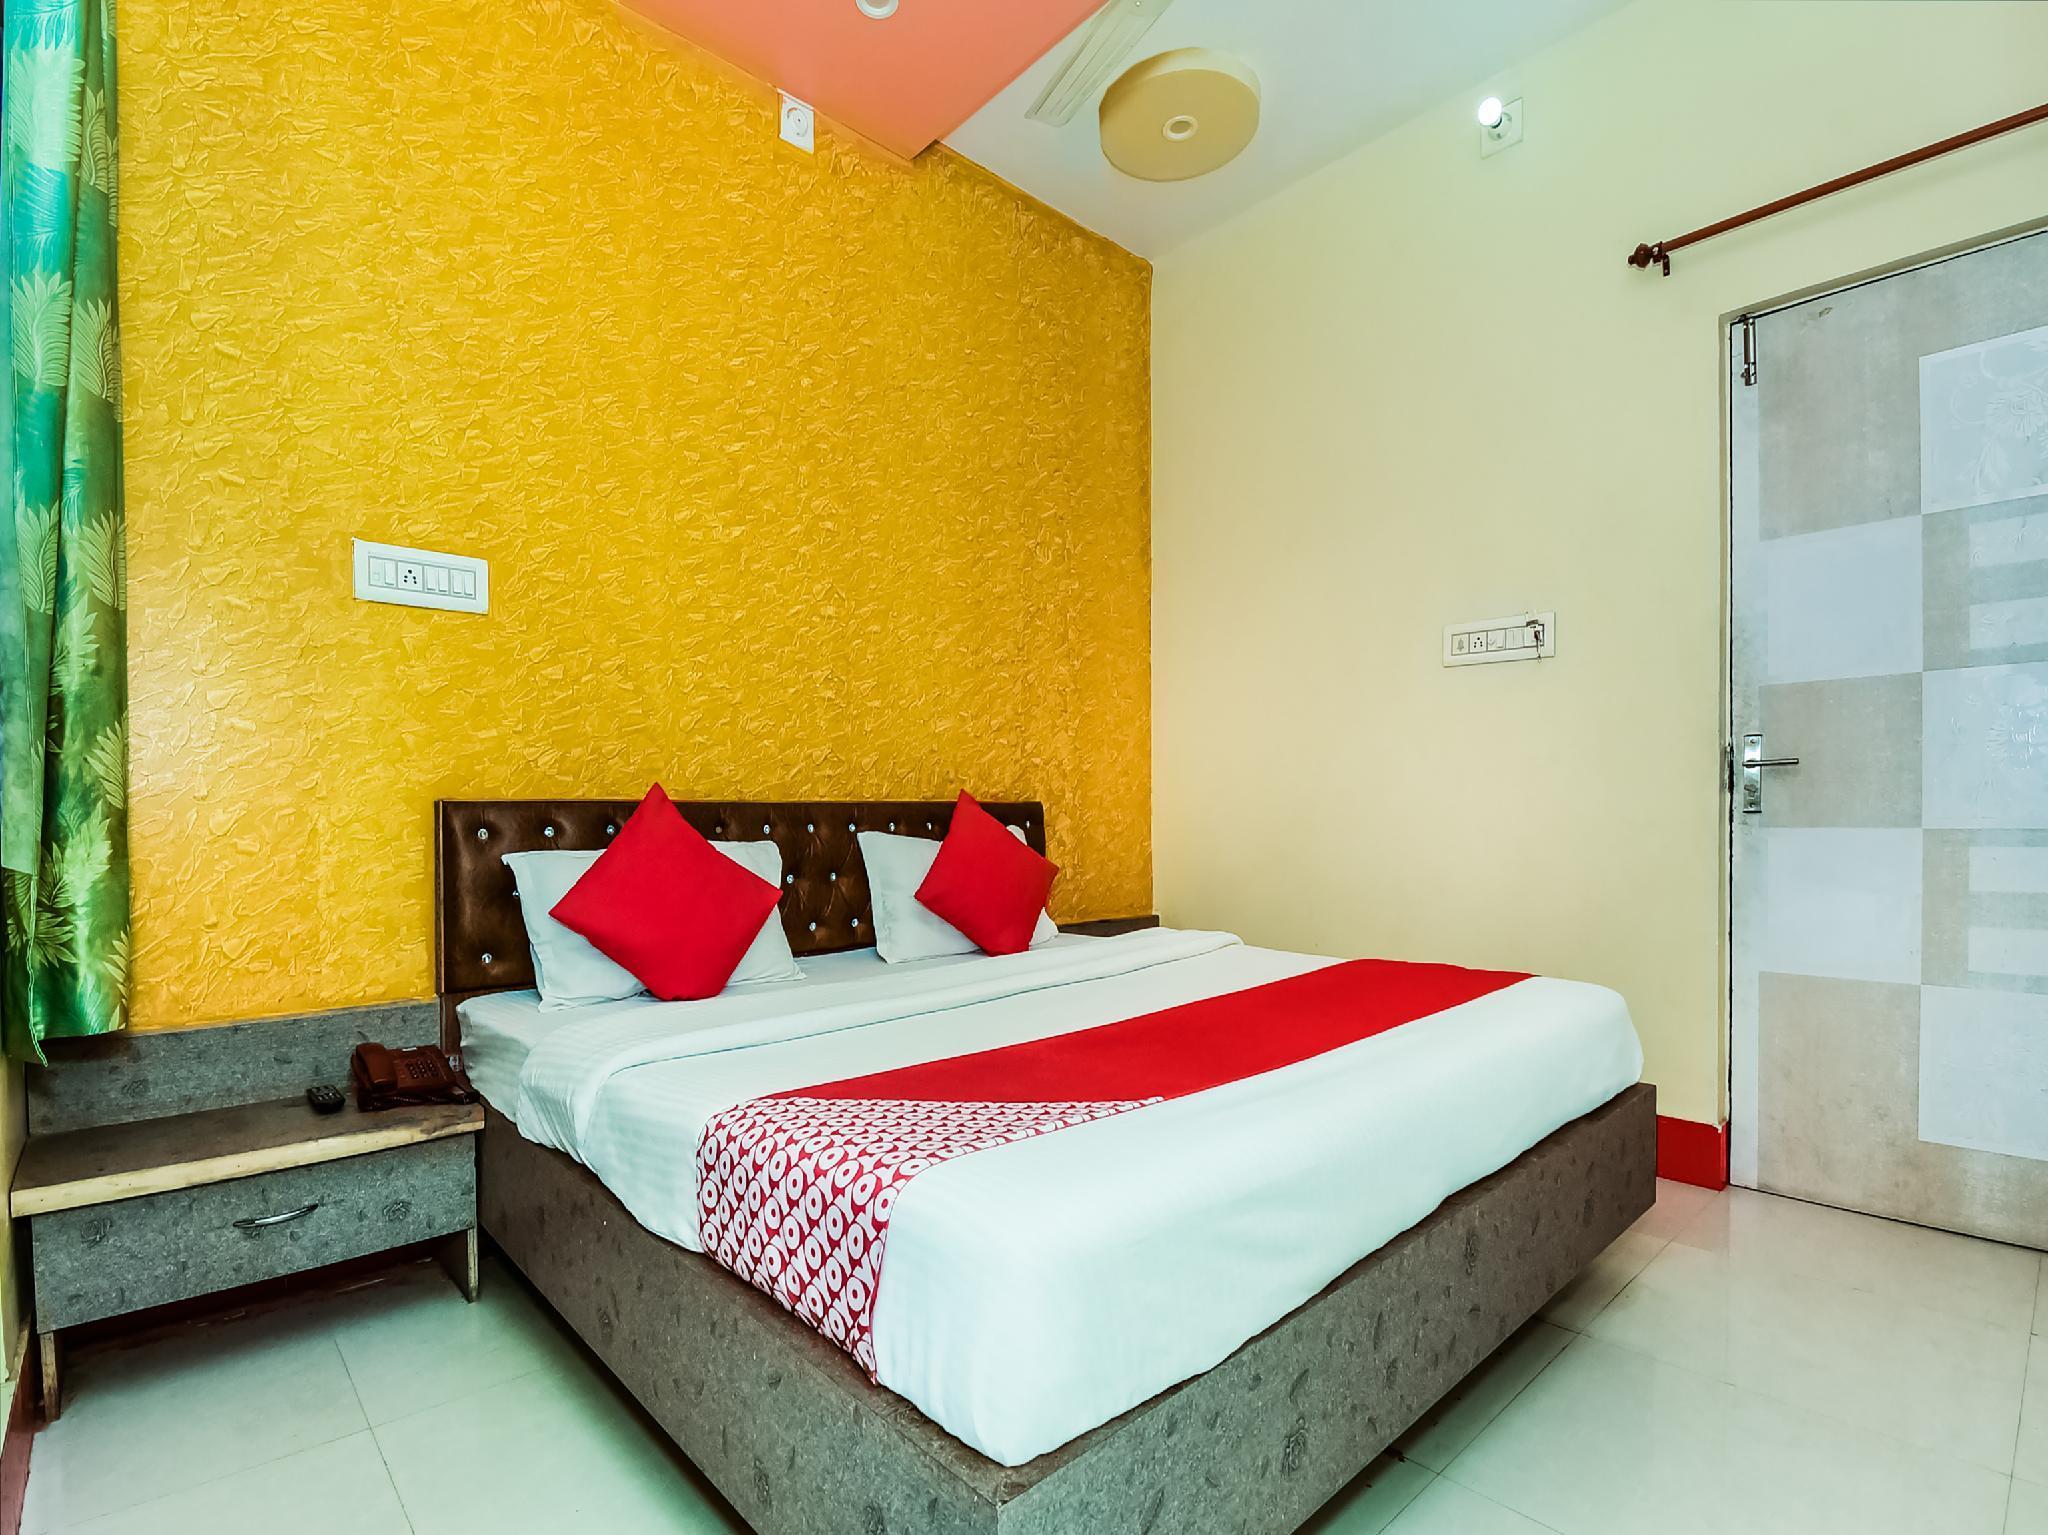 OYO 37863 Hotel Dharam Palace